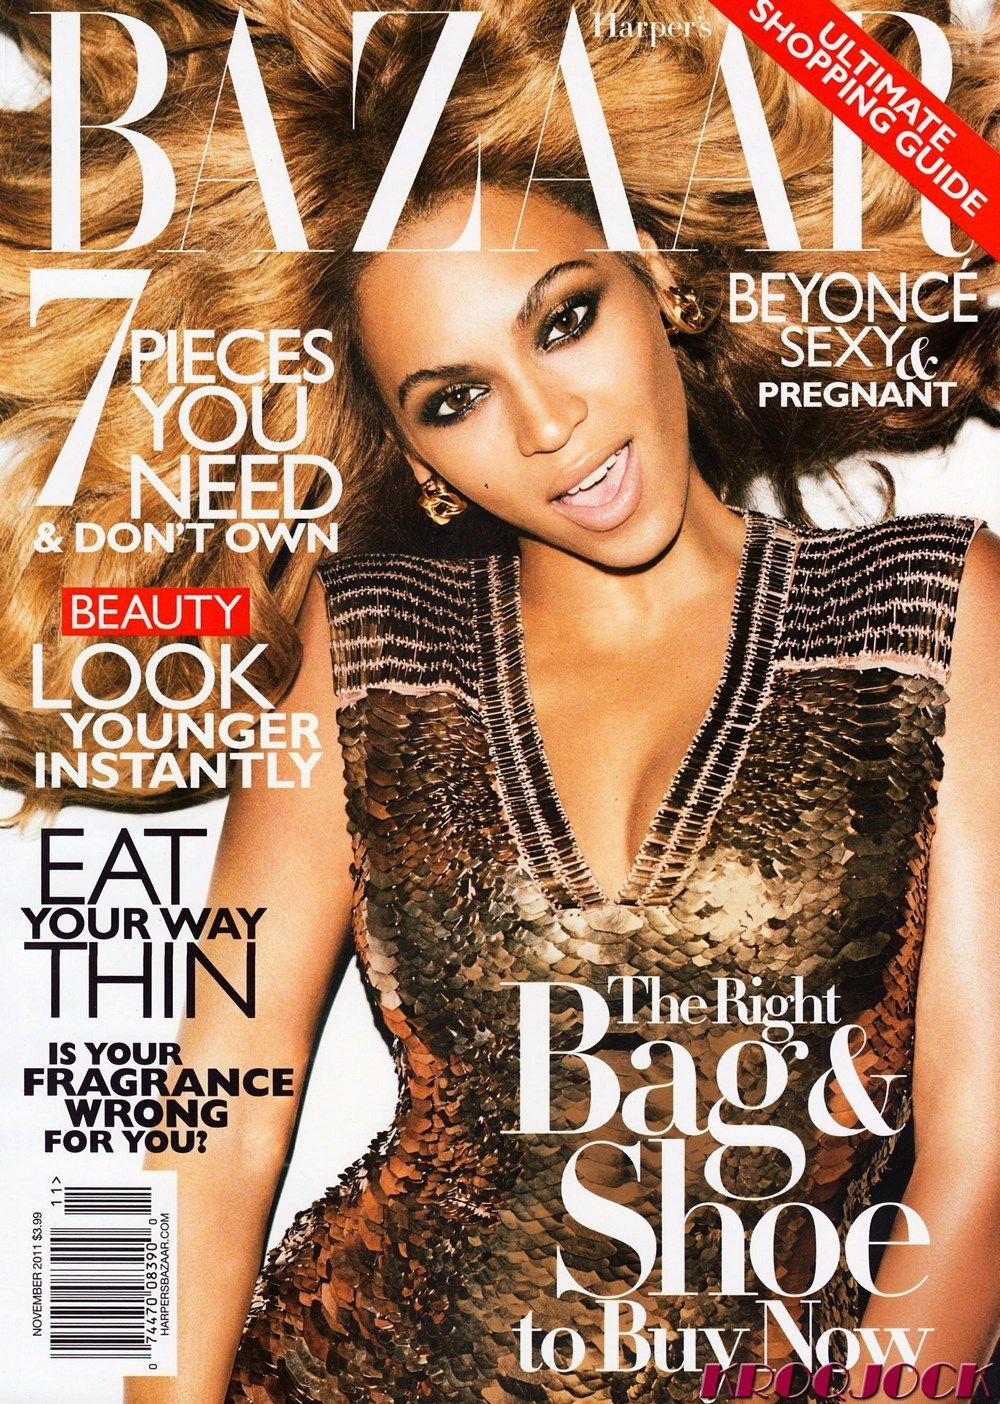 Harper Bazzar's #Fashion Magazine